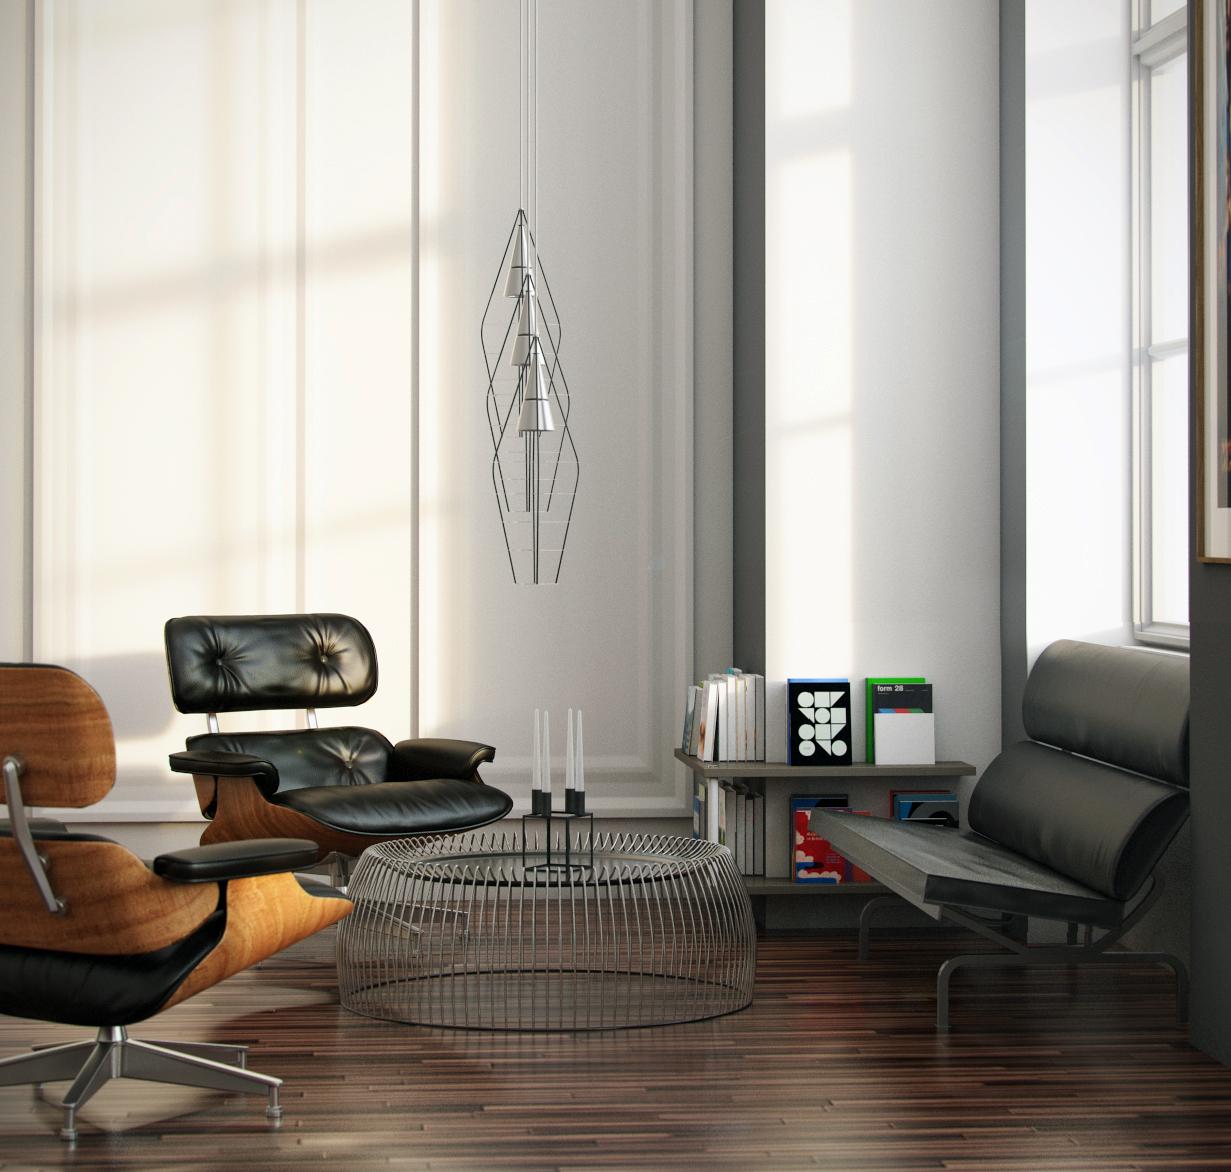 Cg m arket3d hdri lighting for realistic rendering - 3ds max vray exterior lighting tutorials pdf ...